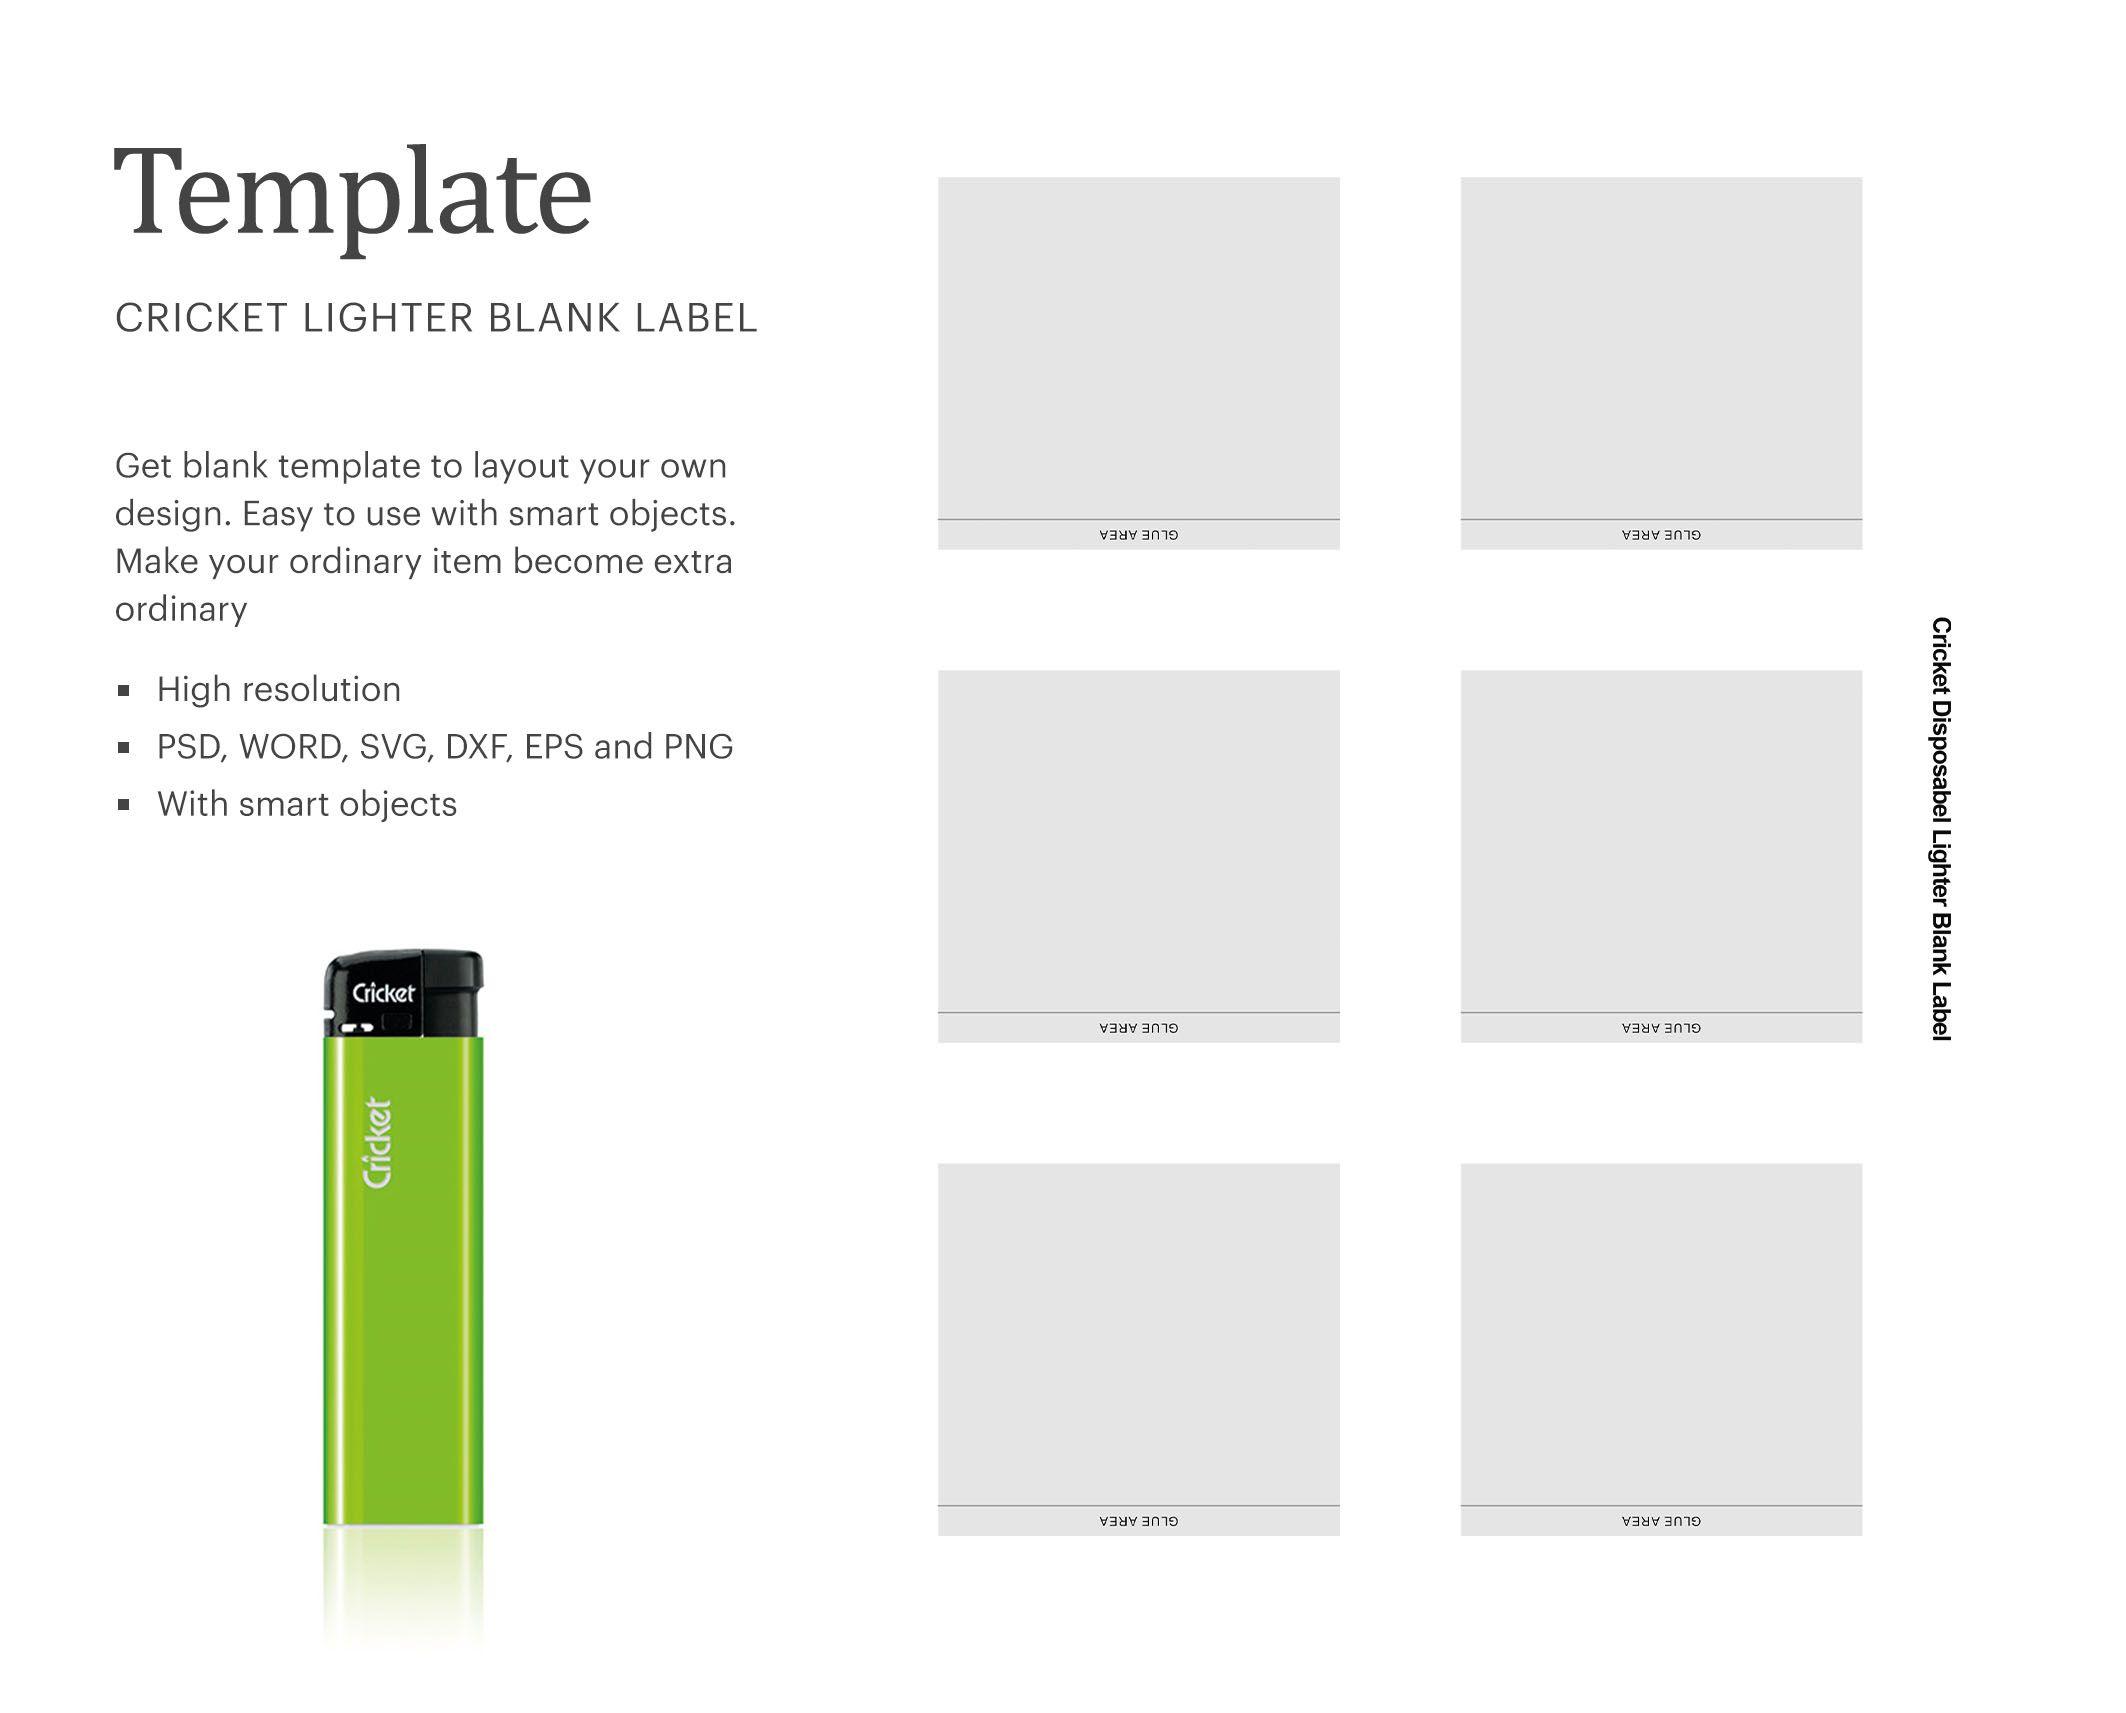 Custom Cricket Lighter Label Paper Size 8 5 A X 11 A Ad Advertisement Ad Lighter Cricket Paper Label Cricket Lighter Paper Size Templates